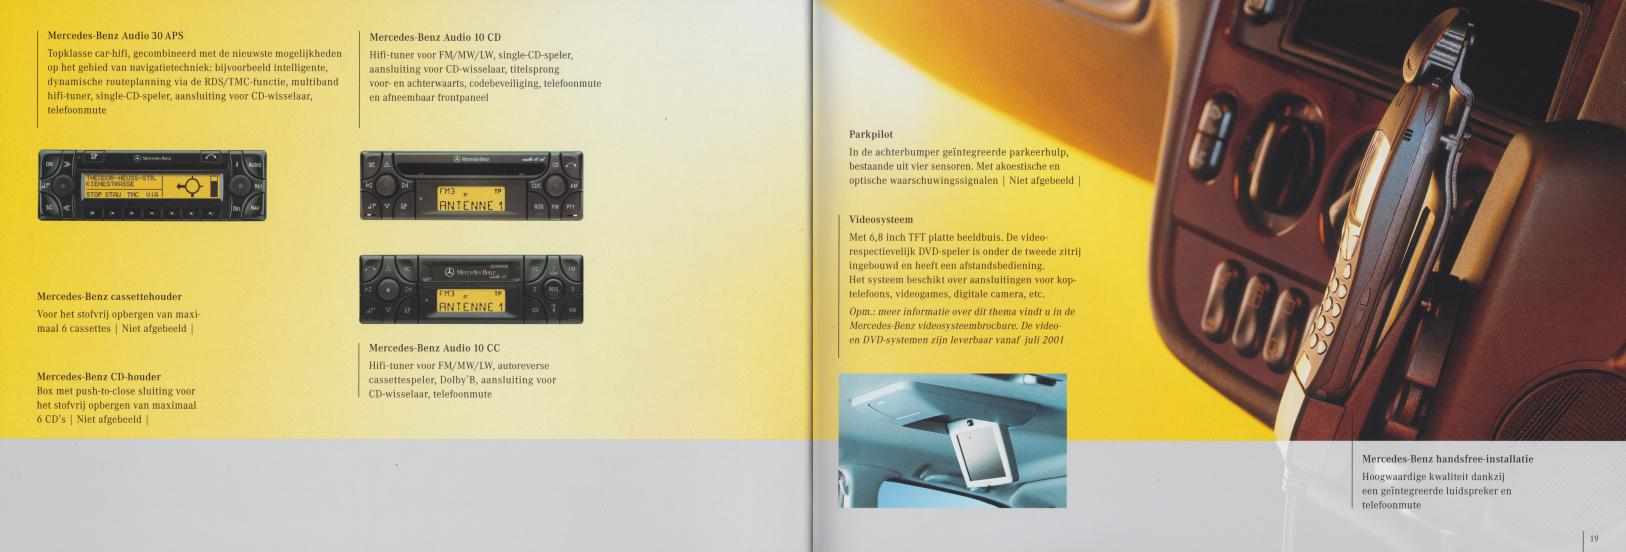 (W163): Catálogo 2001 - acessórios - neerlandês 010